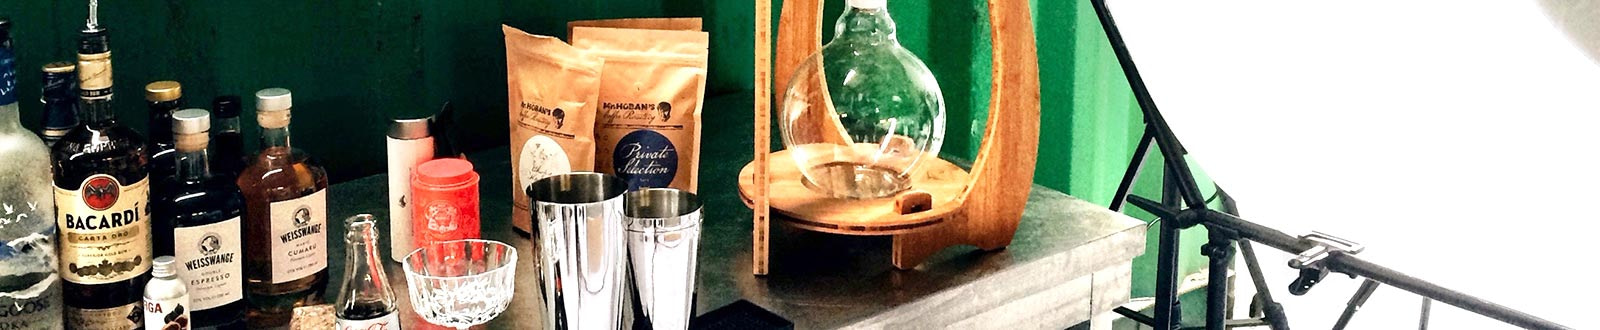 Über Uns > das mōt bottled cocktail shop labor